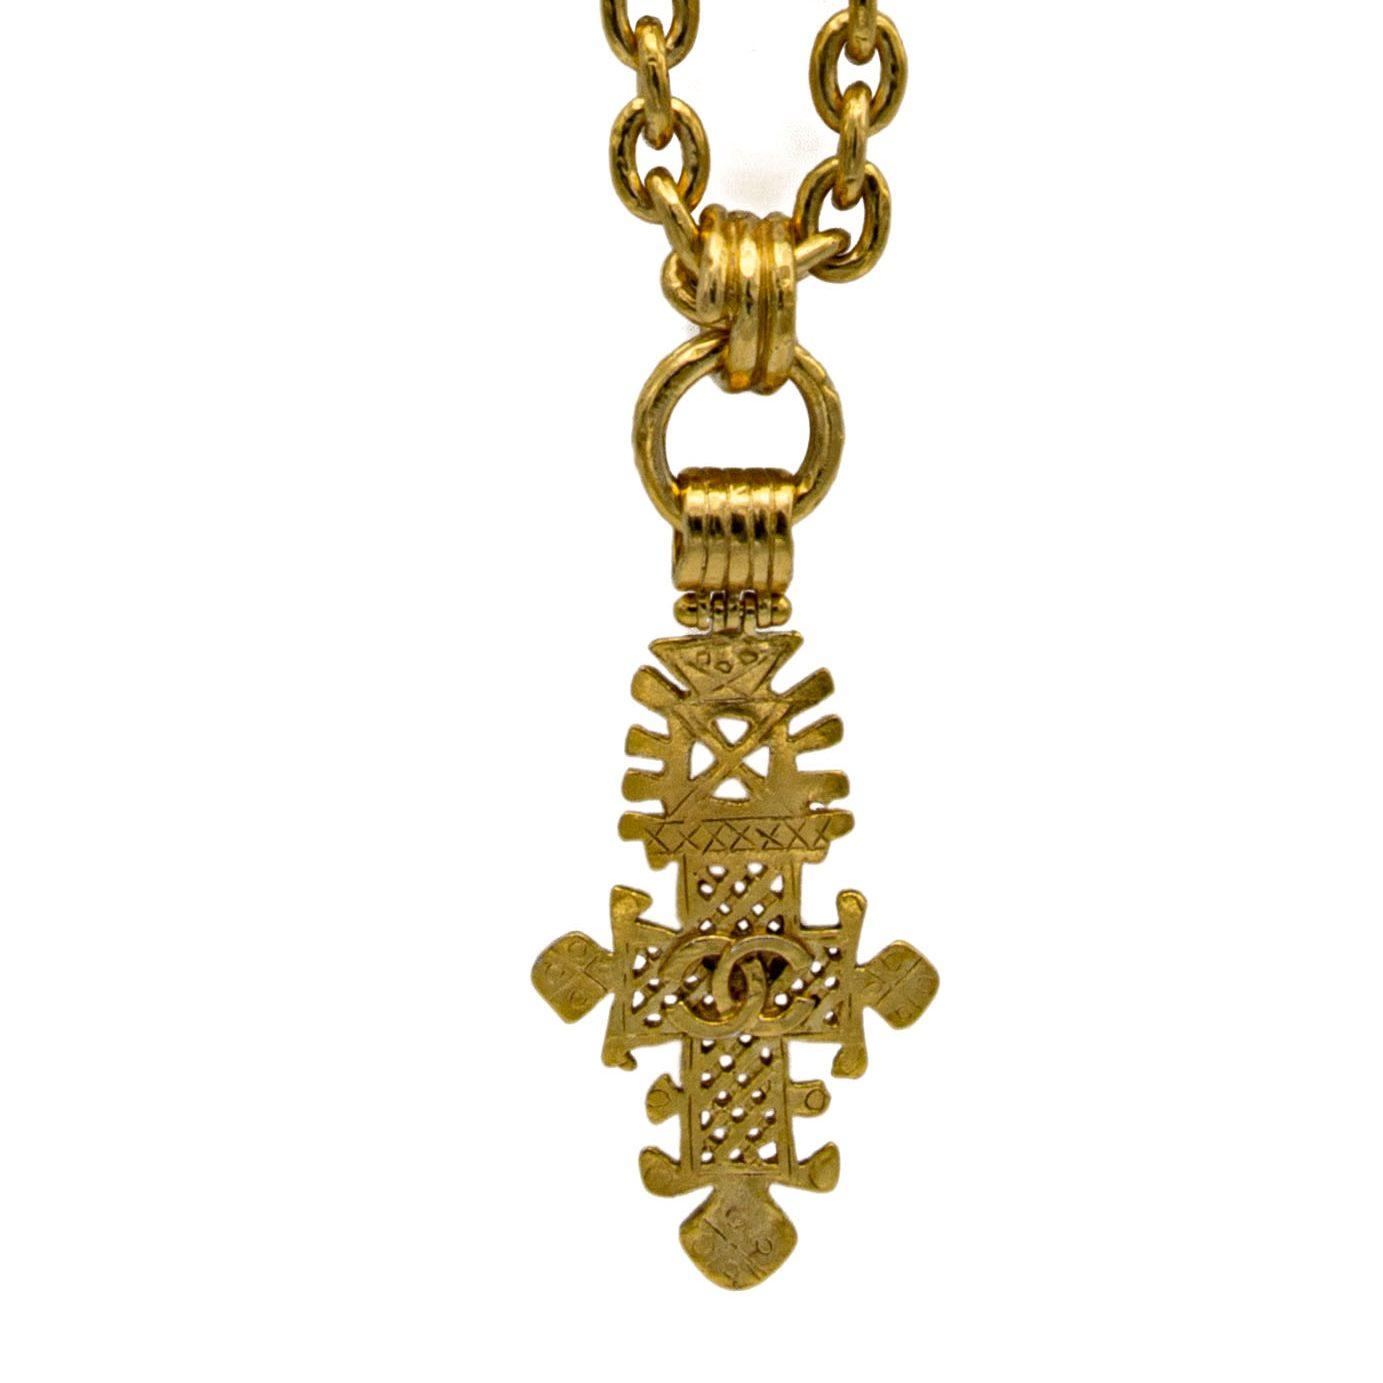 Chanel Pierced Cross Pendant Necklace, Spring 1994